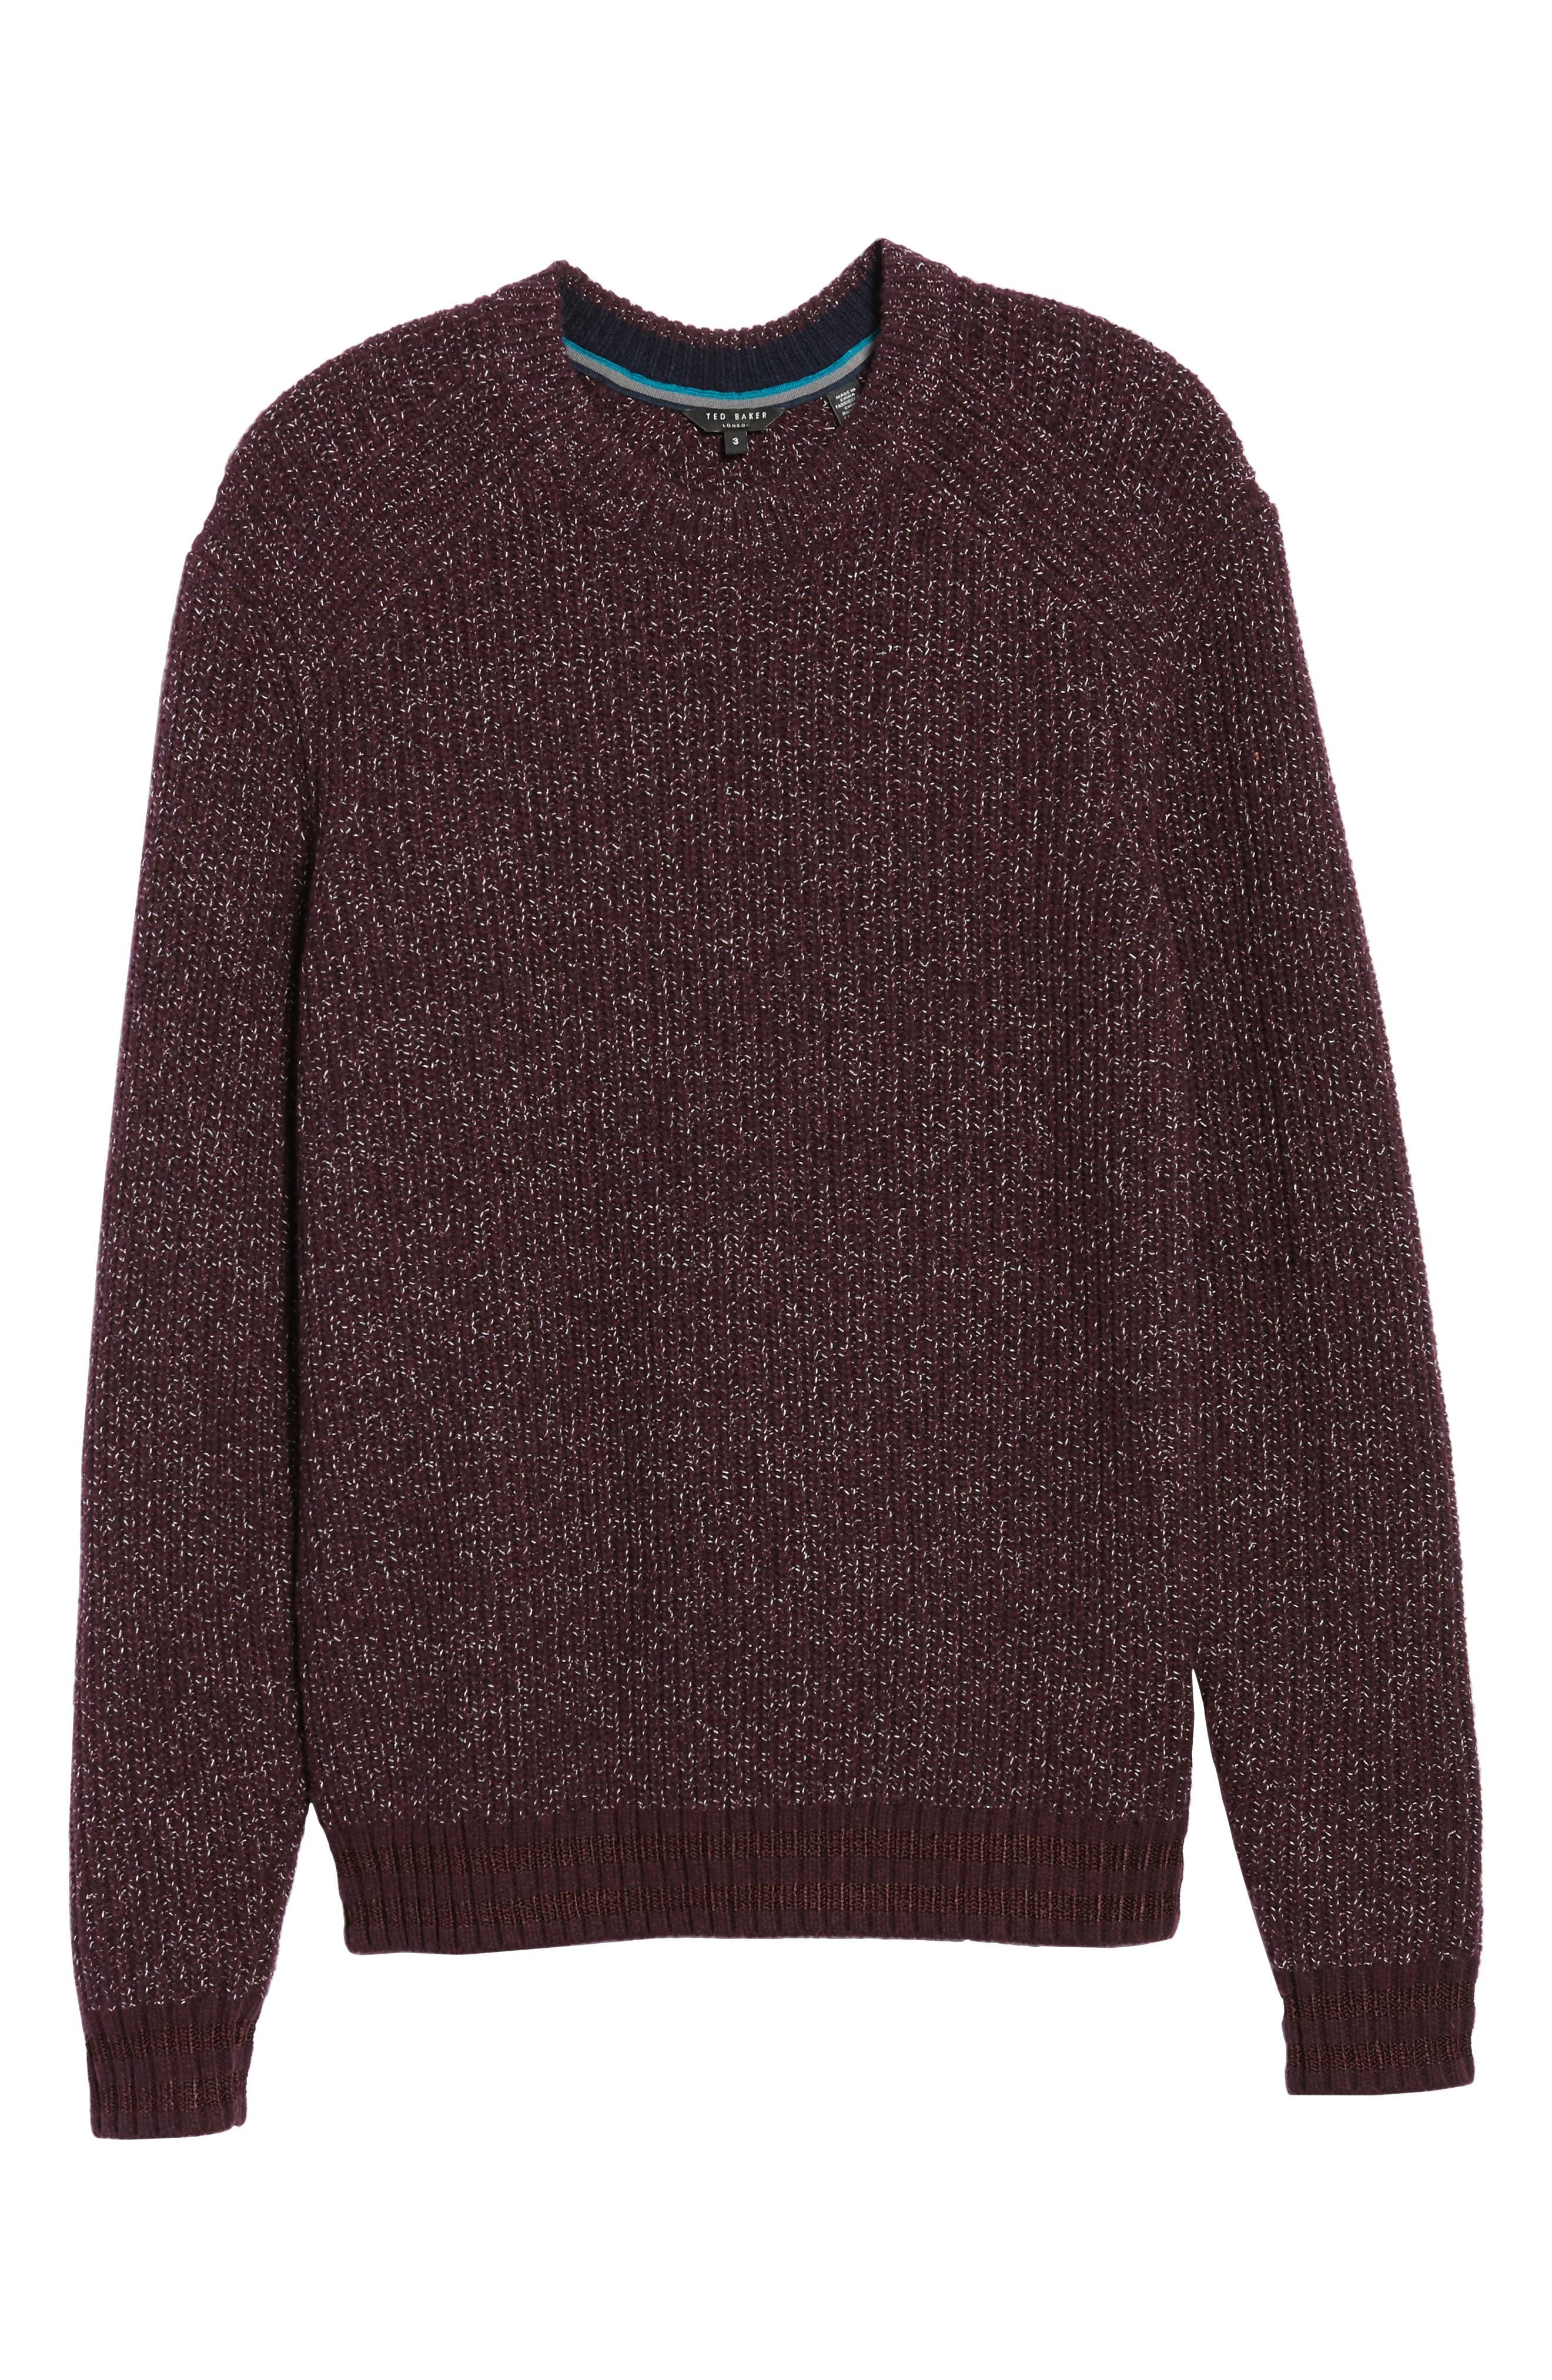 Dot Fielitza Jacquard Sweater,                             Alternate thumbnail 6, color,                             Dark Dahlia